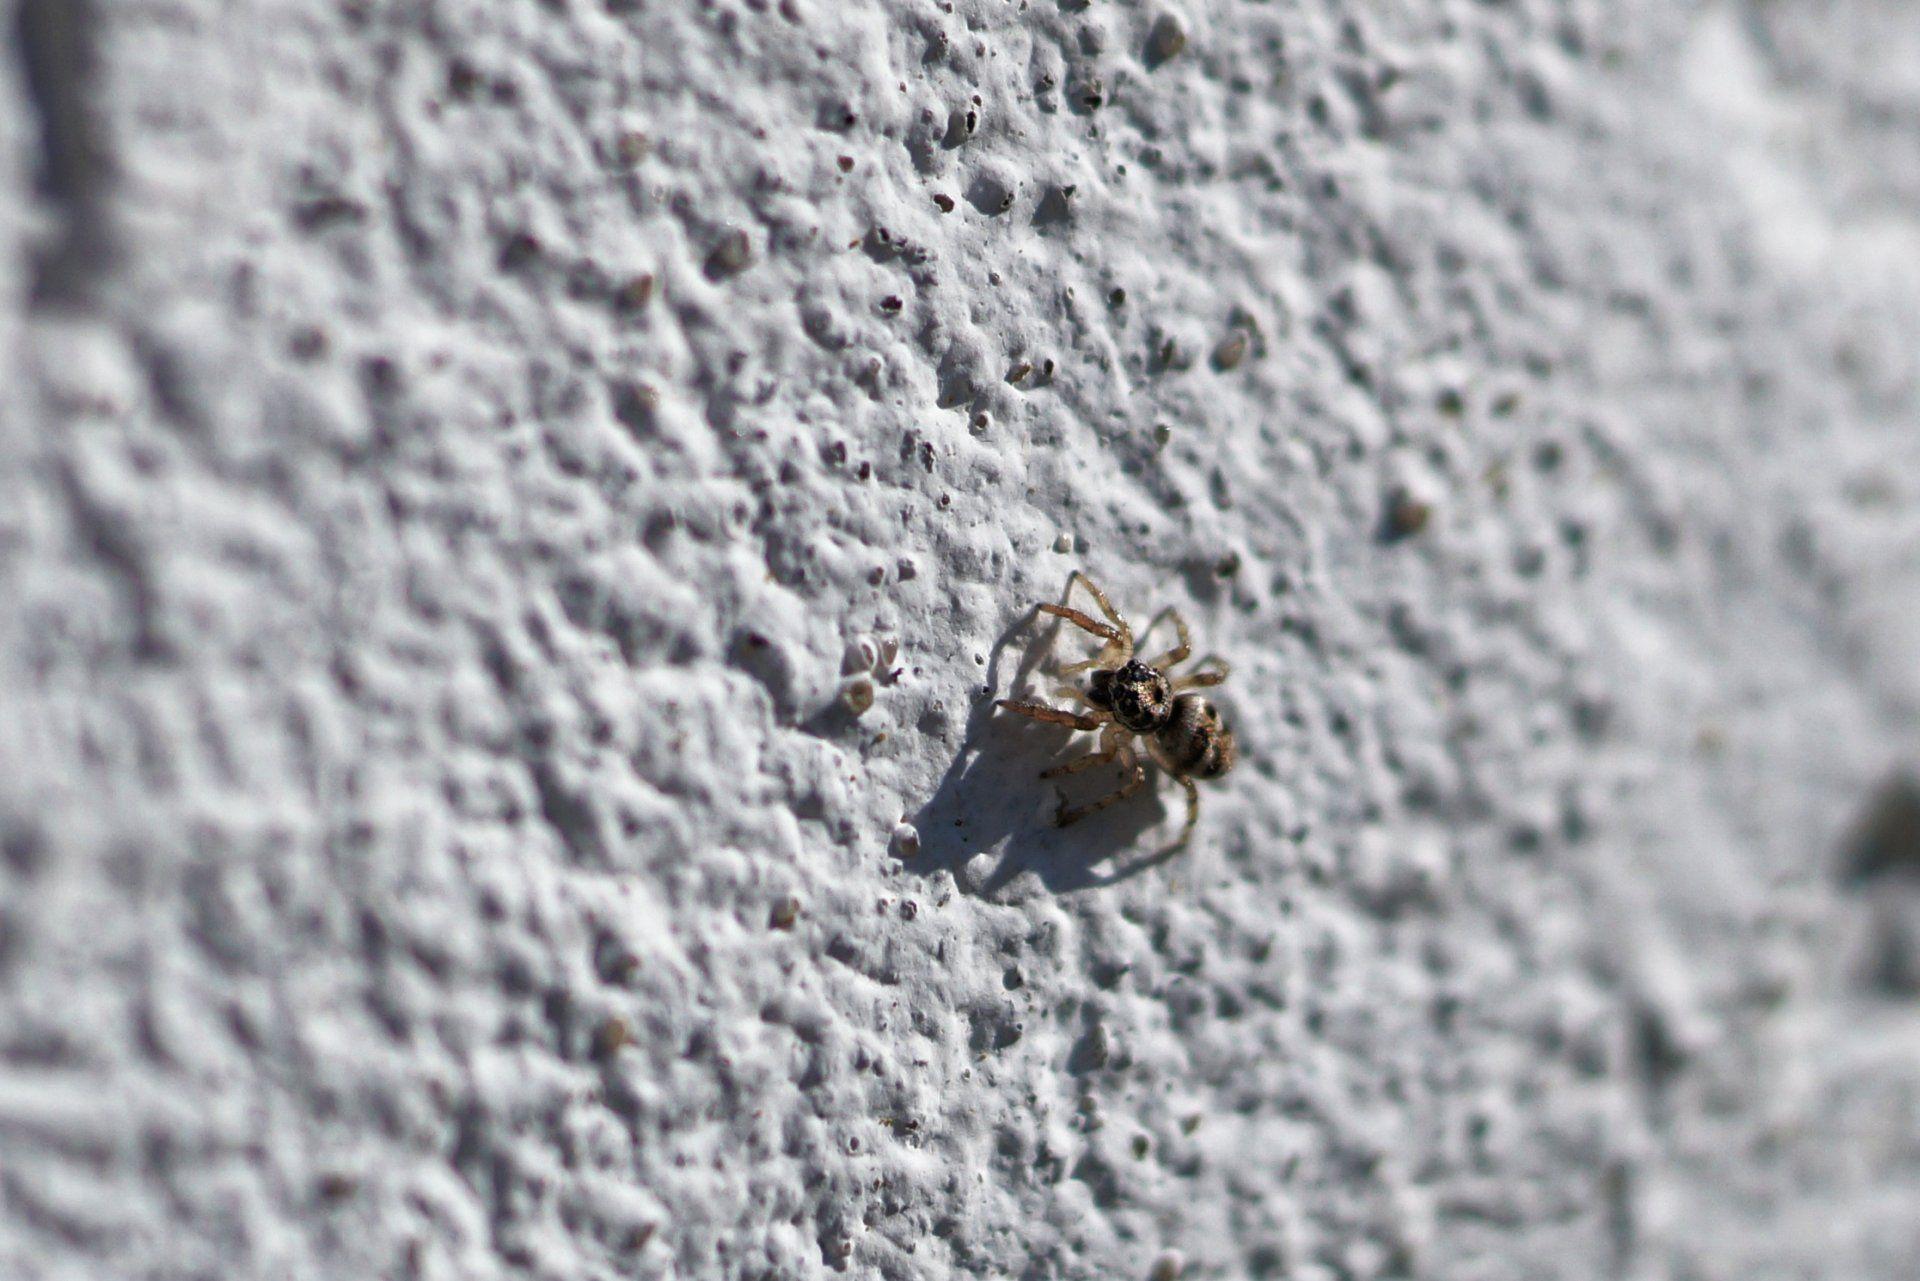 Mini Spinne In Nahaufnahme Nahaufnahmen Insekten Bilder Tiere